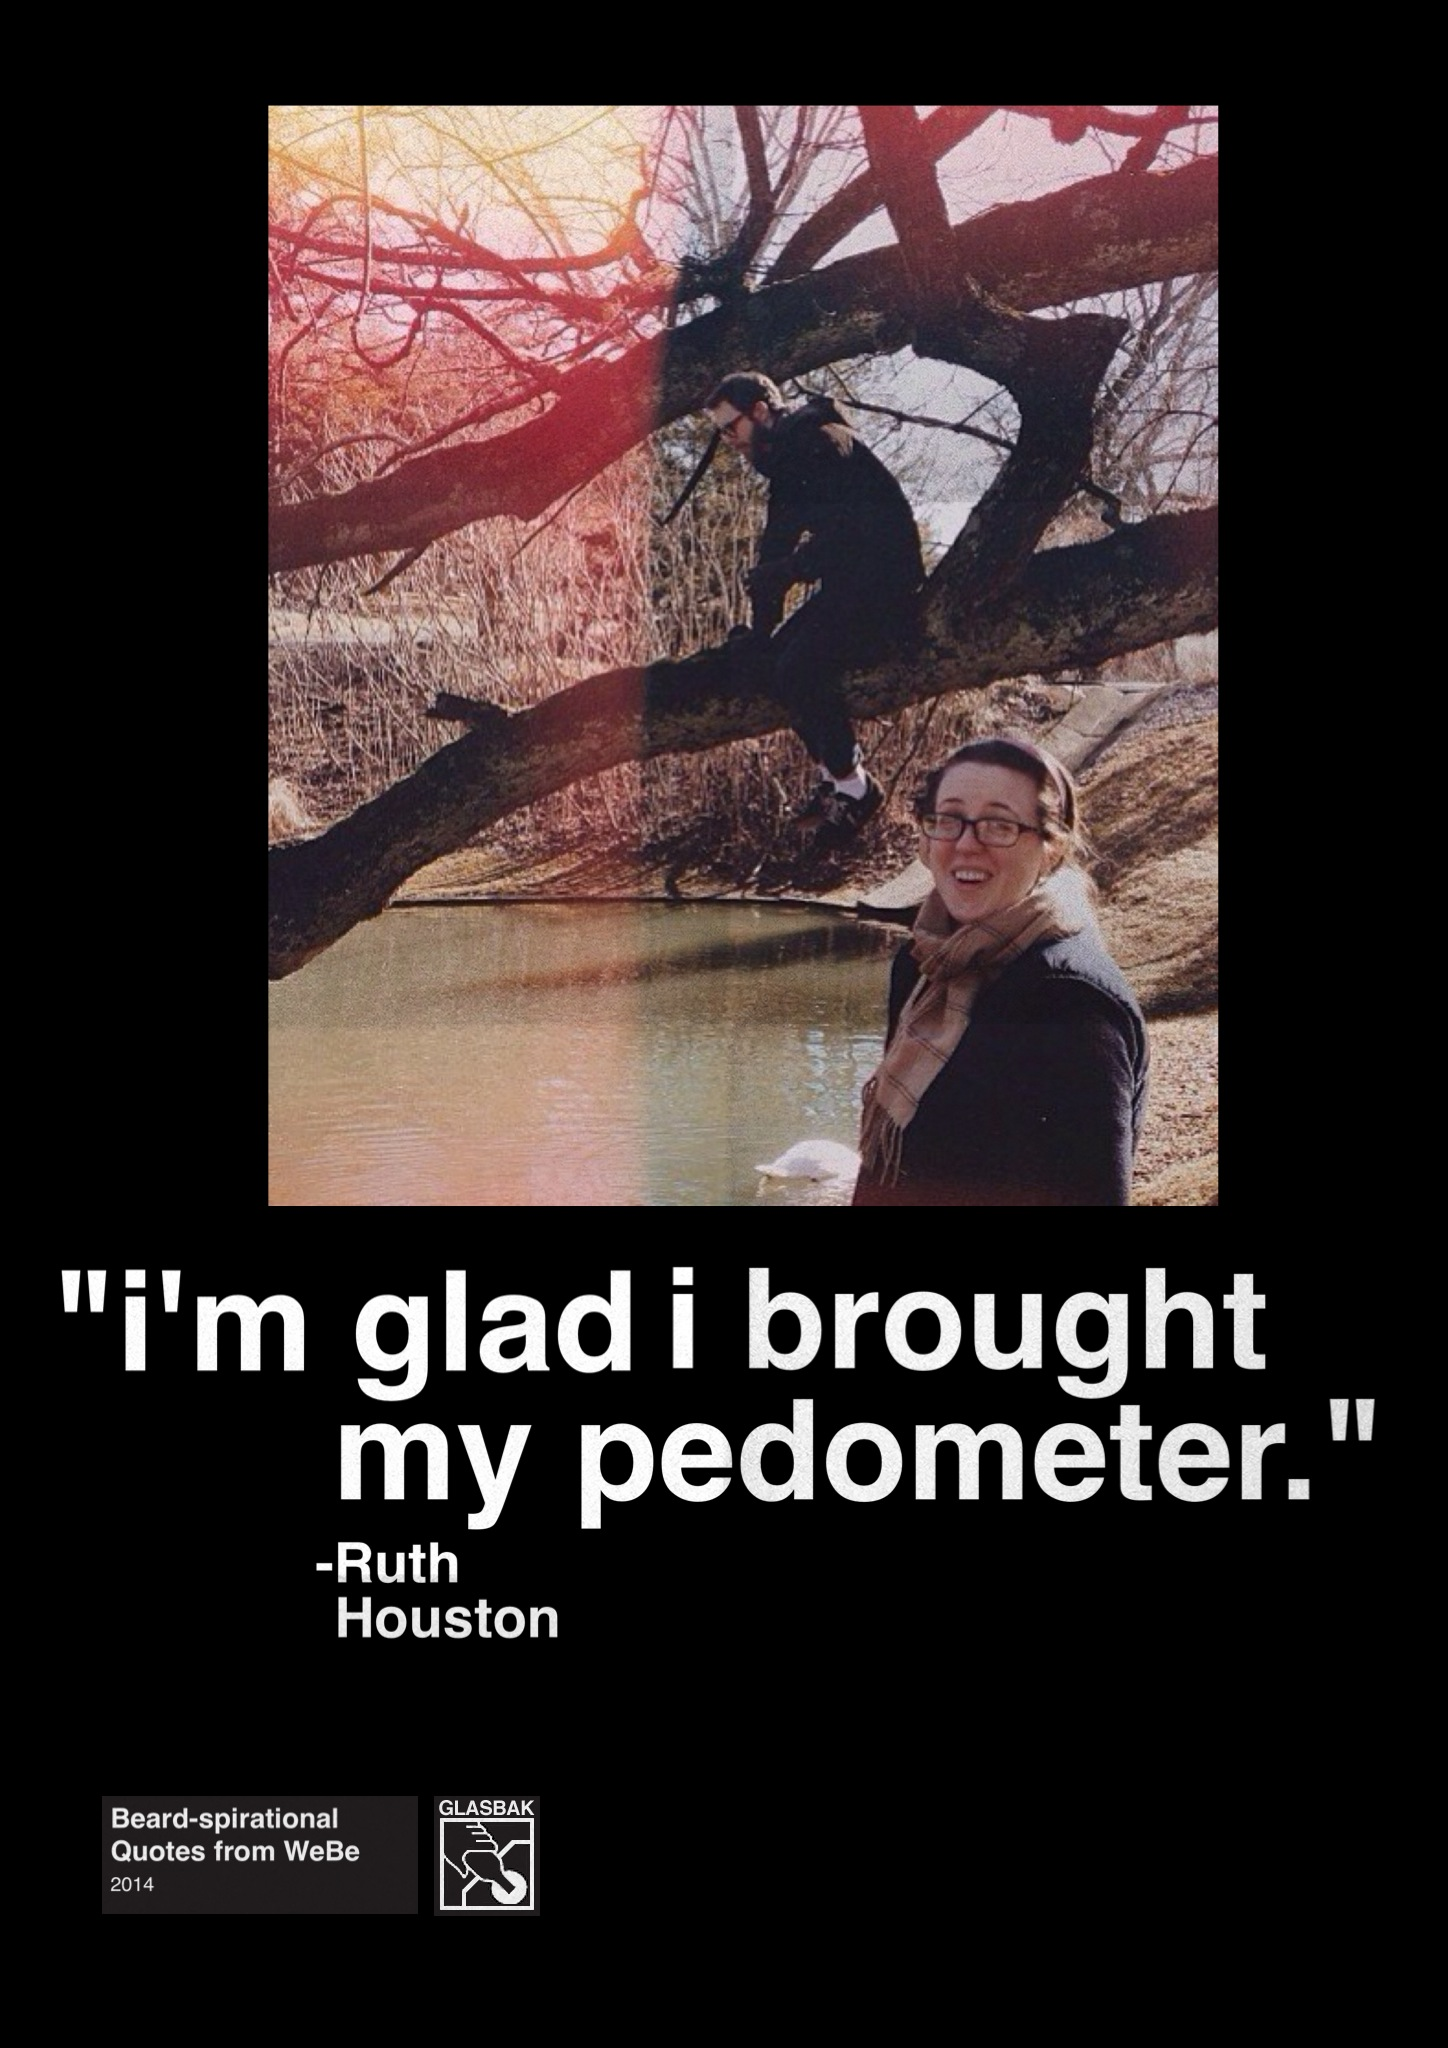 2014-02-25_i'm glad i brought my pedometer.jpg